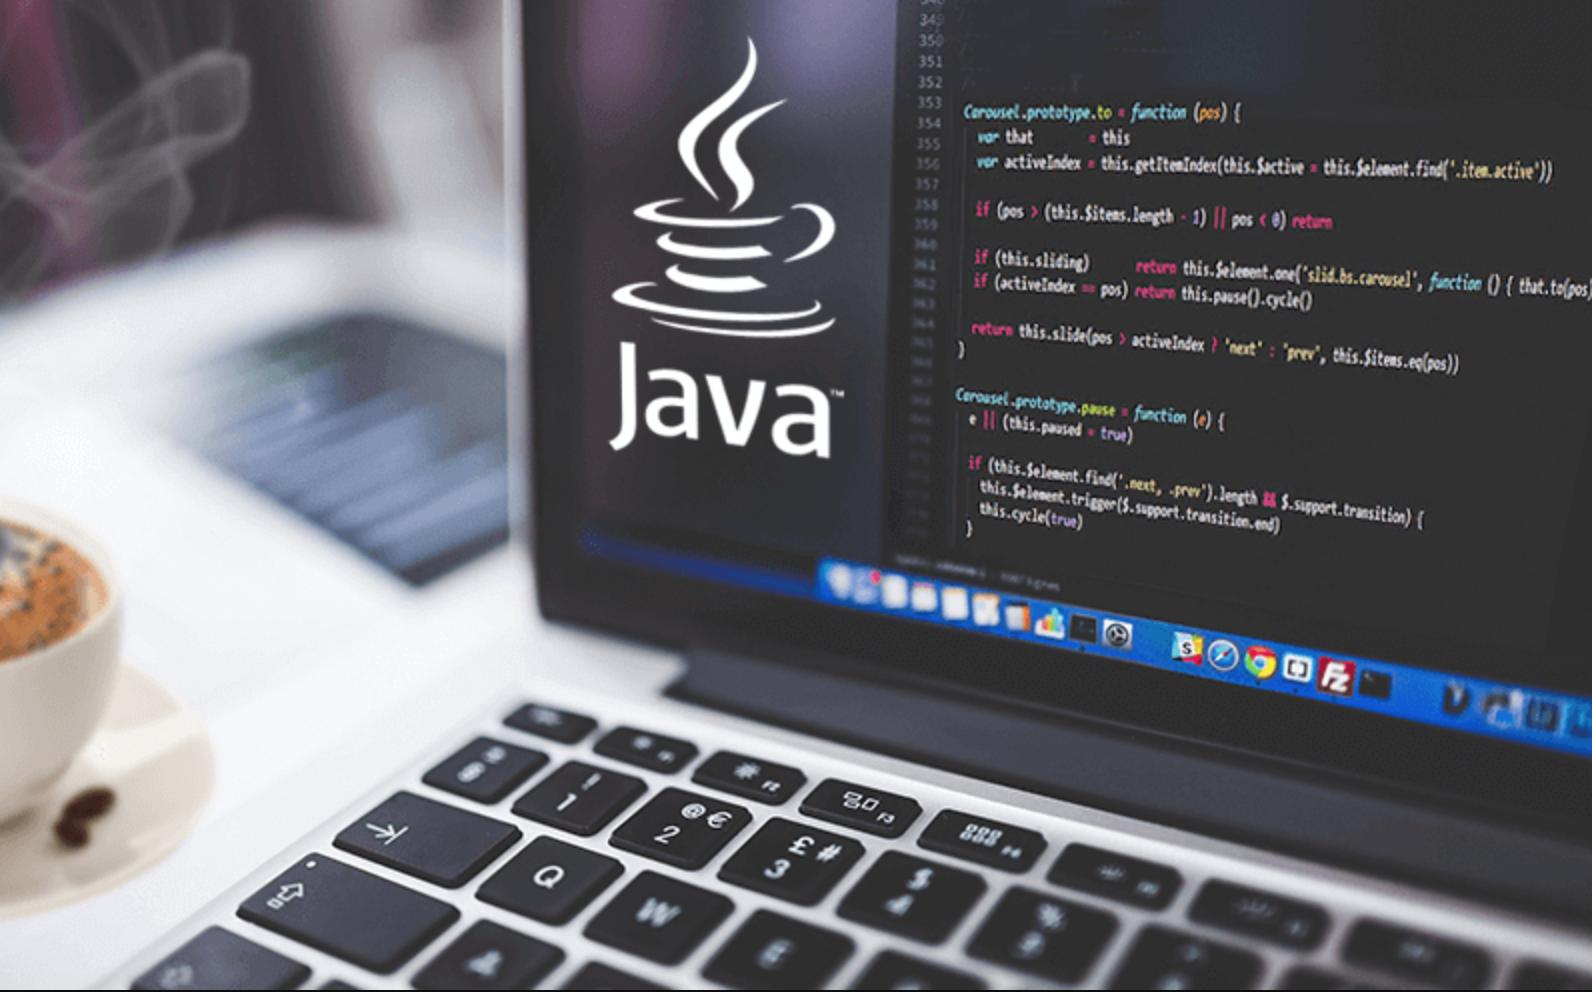 Windows,macOS,Linux中的jdk环境变量配置